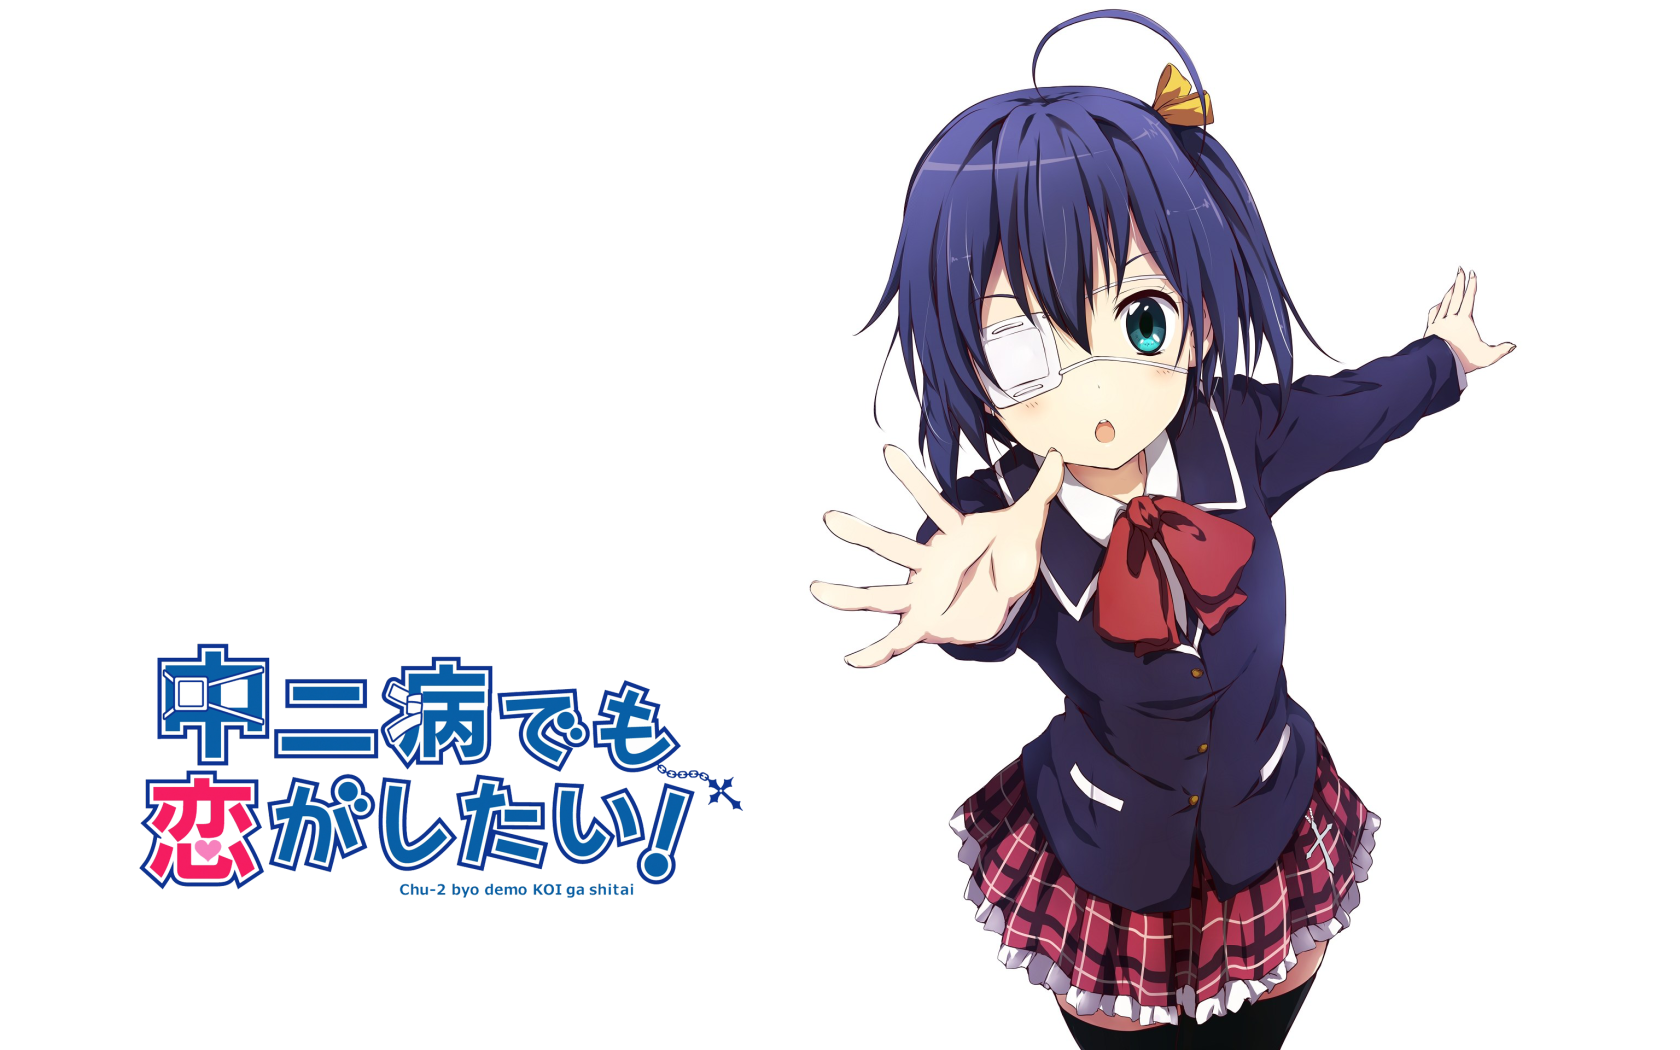 Chuunibyou Demo Koi Ga Shitai Wallpapers - Anime Girl Navy Blue Hair , HD Wallpaper & Backgrounds